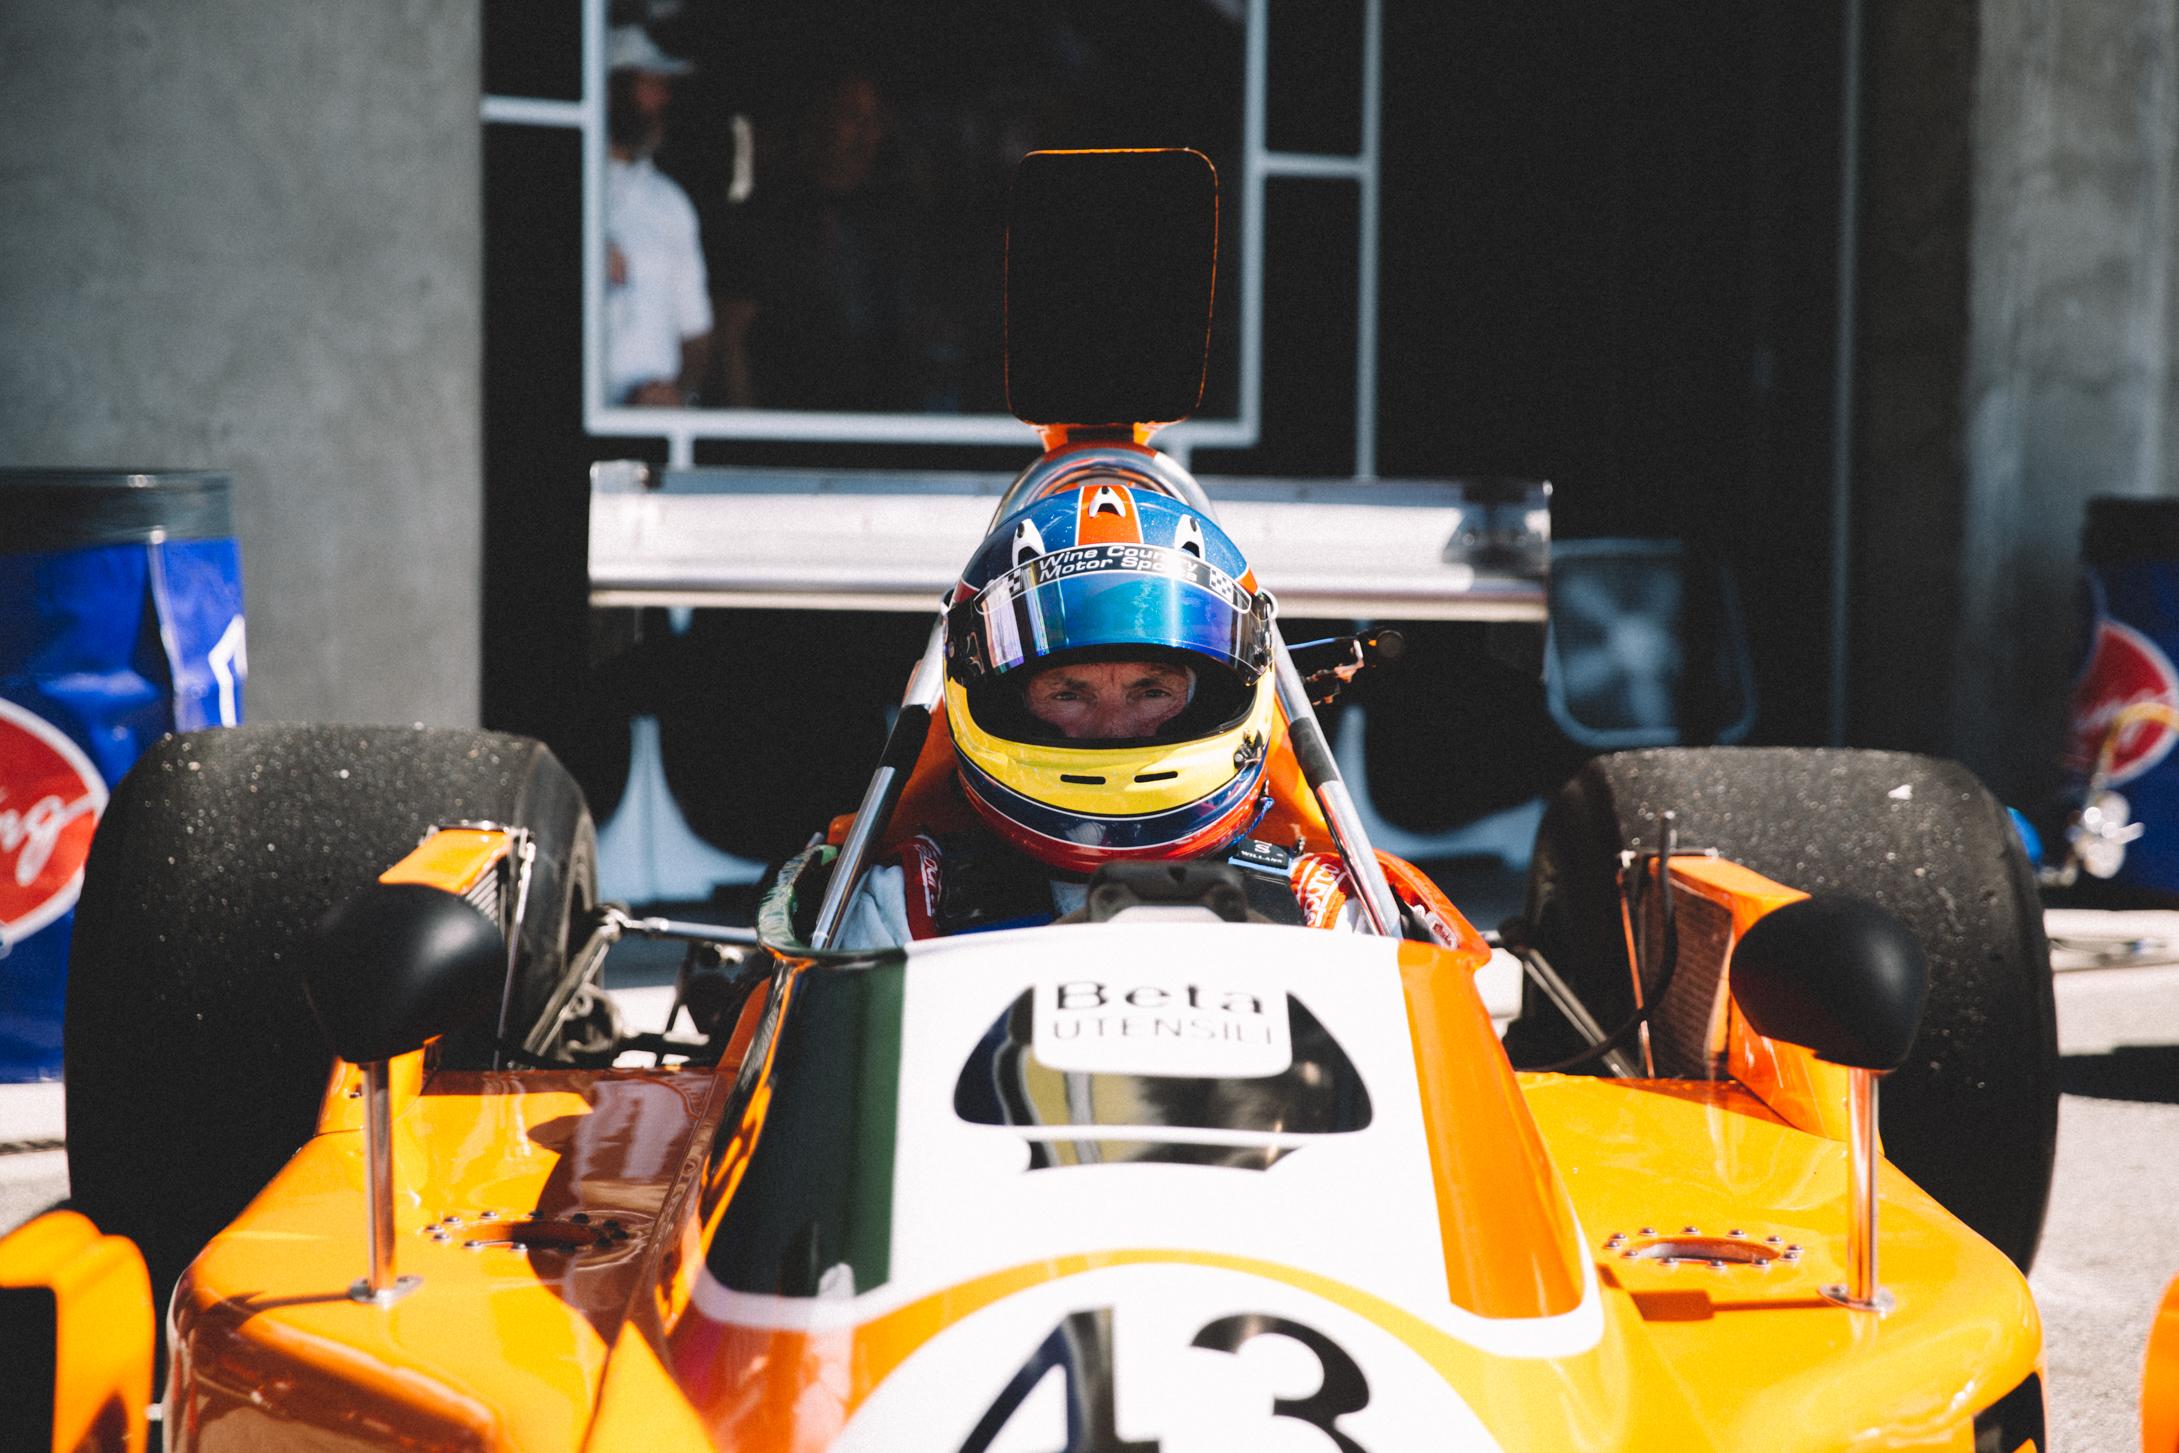 F1 (1 of 1)-6.jpg